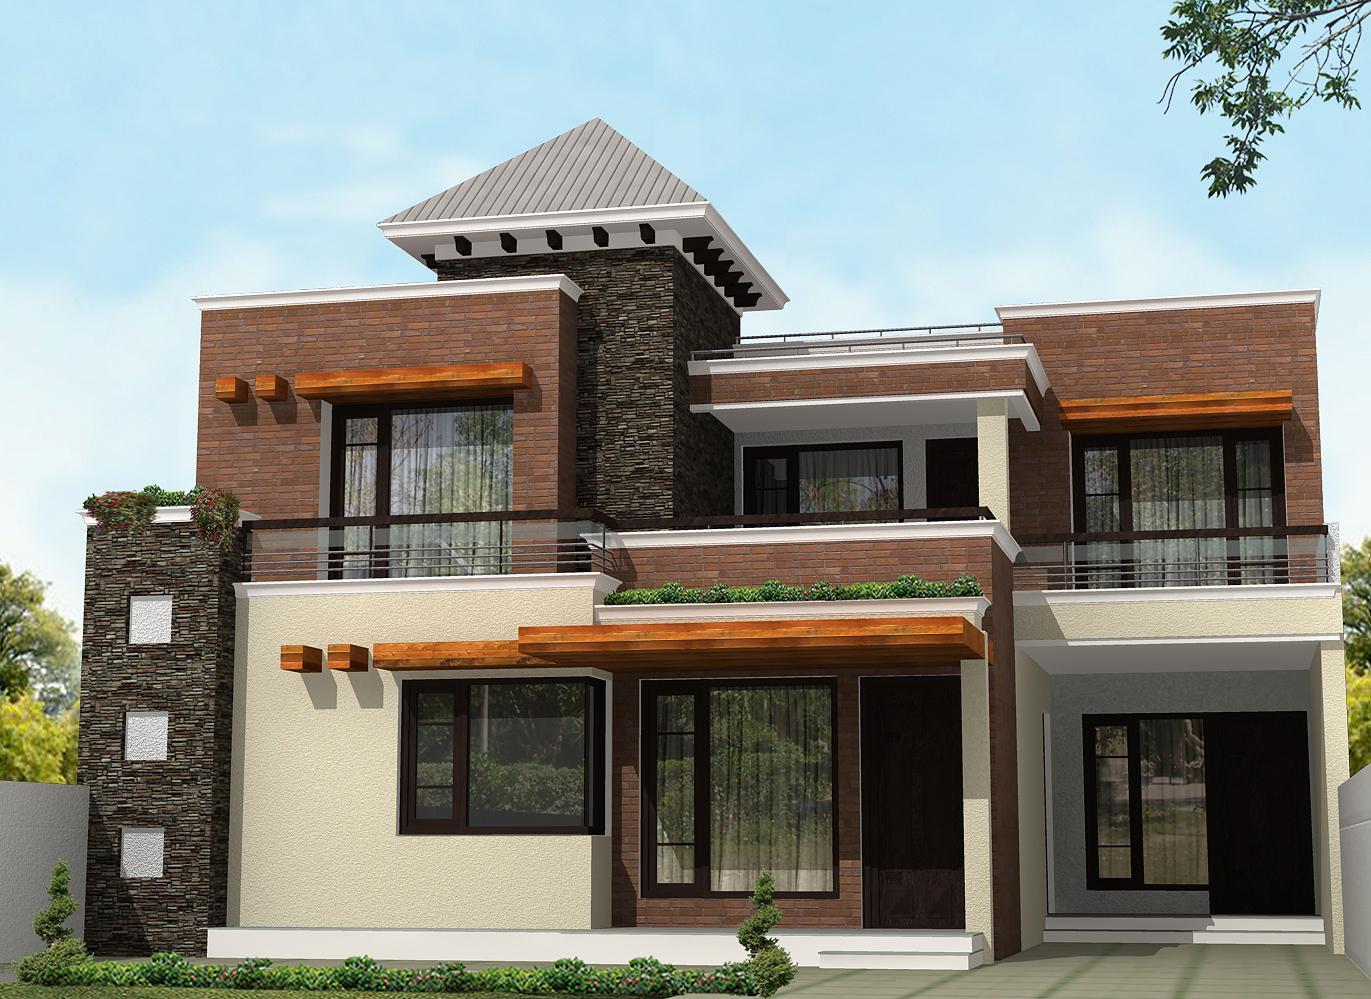 Exterior Elevation Design For .